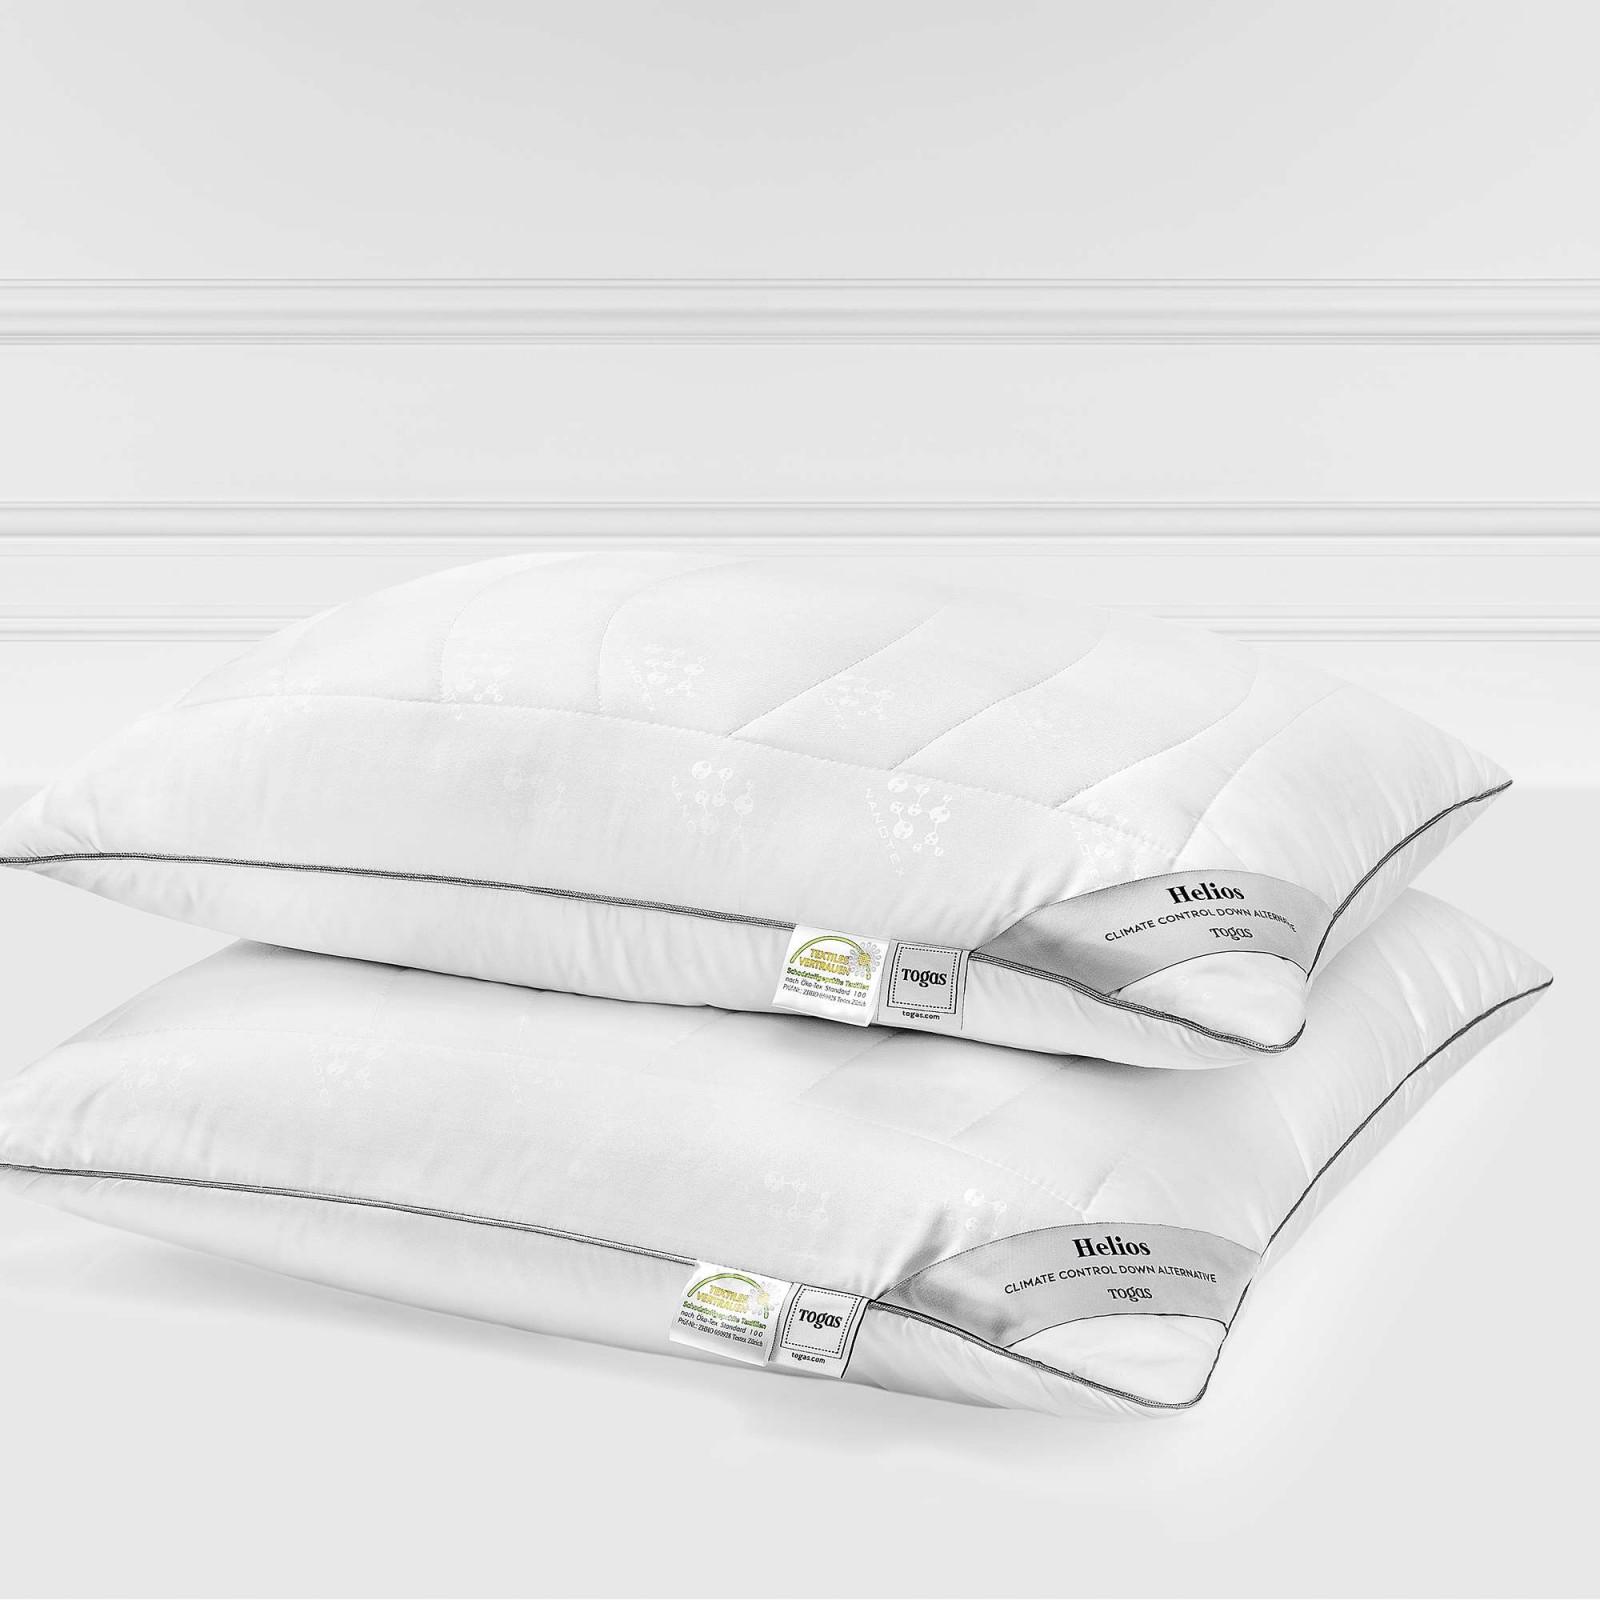 Подушки Togas Подушка Гелиос Средняя (70х70) одеяла togas одеяло гелиос 220х240 см